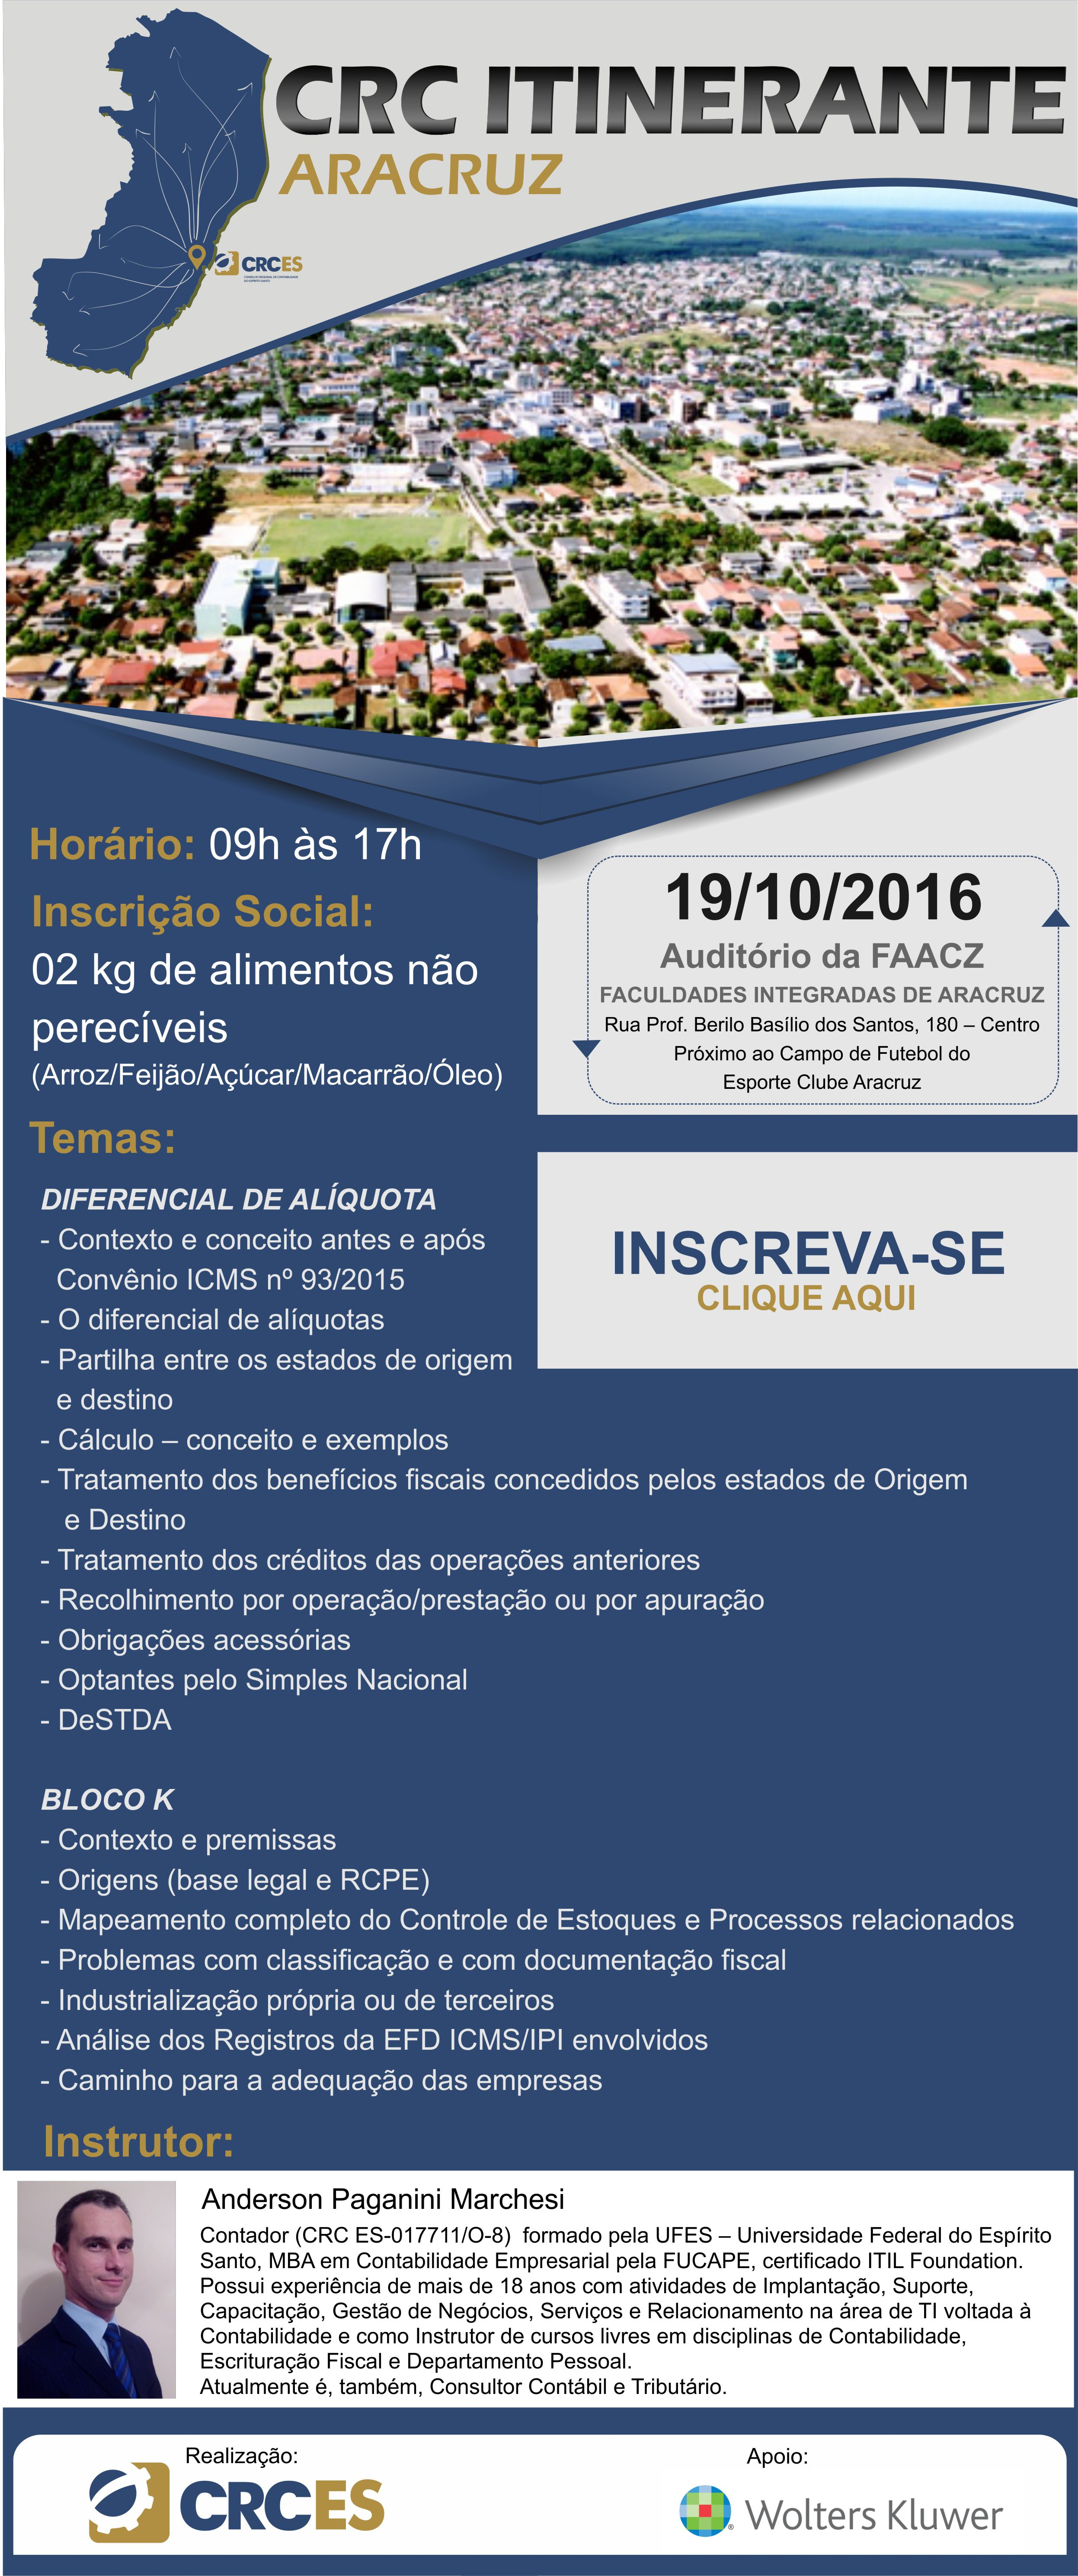 crcitinerante_aracruz_19out2016_paganini